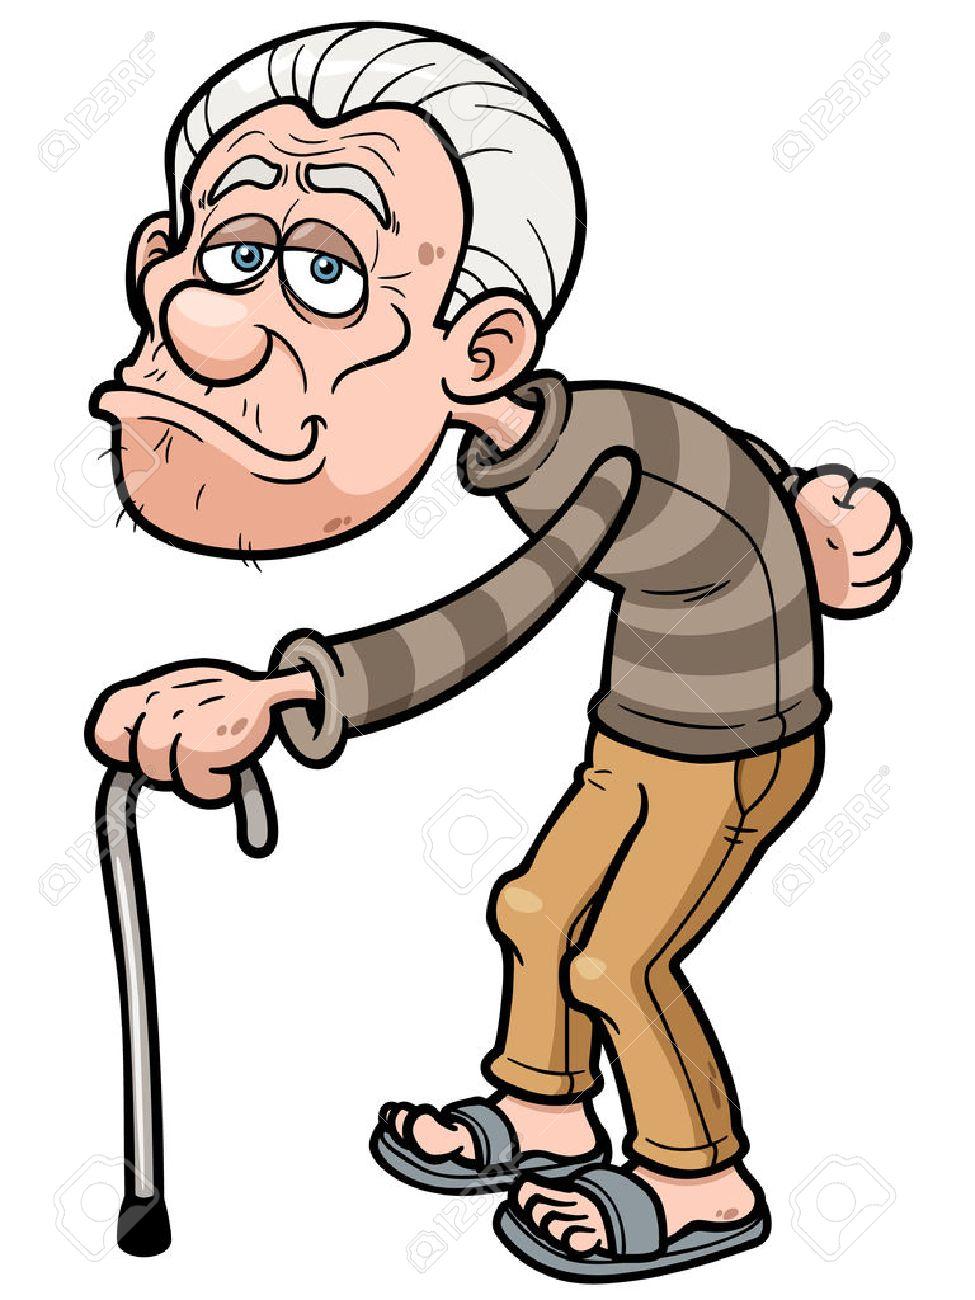 Old Man Cartoon : cartoon, Vector, Illustration, Cartoon, Royalty, Cliparts,, Vectors,, Stock, Illustration., Image, 27769982.